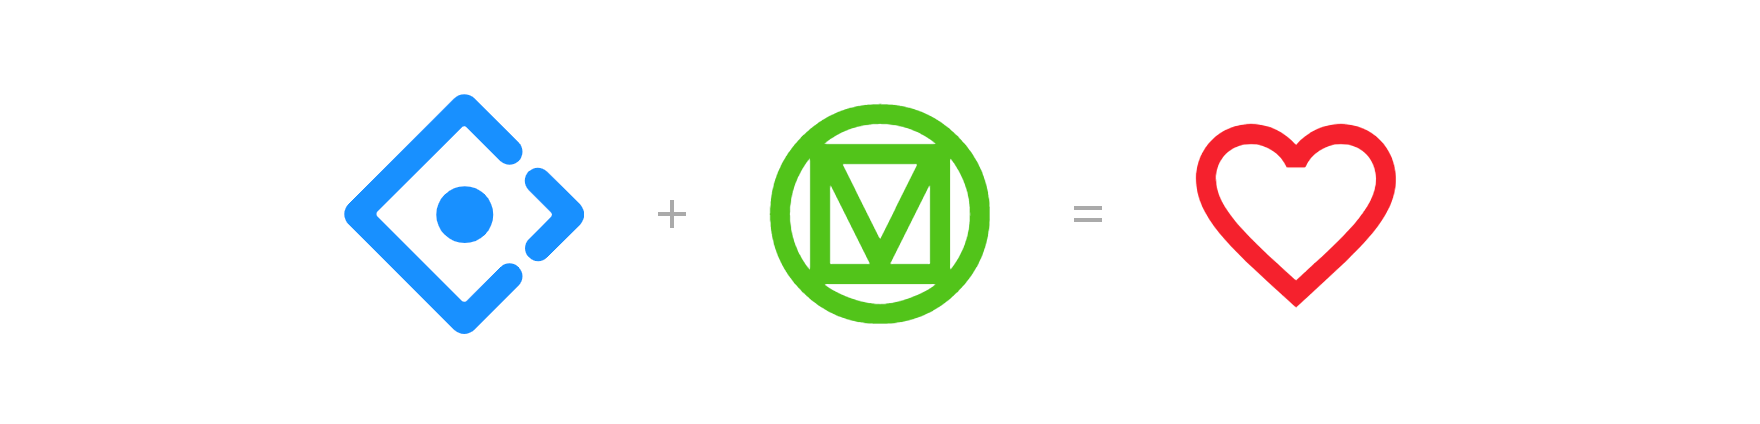 ant-design-icons